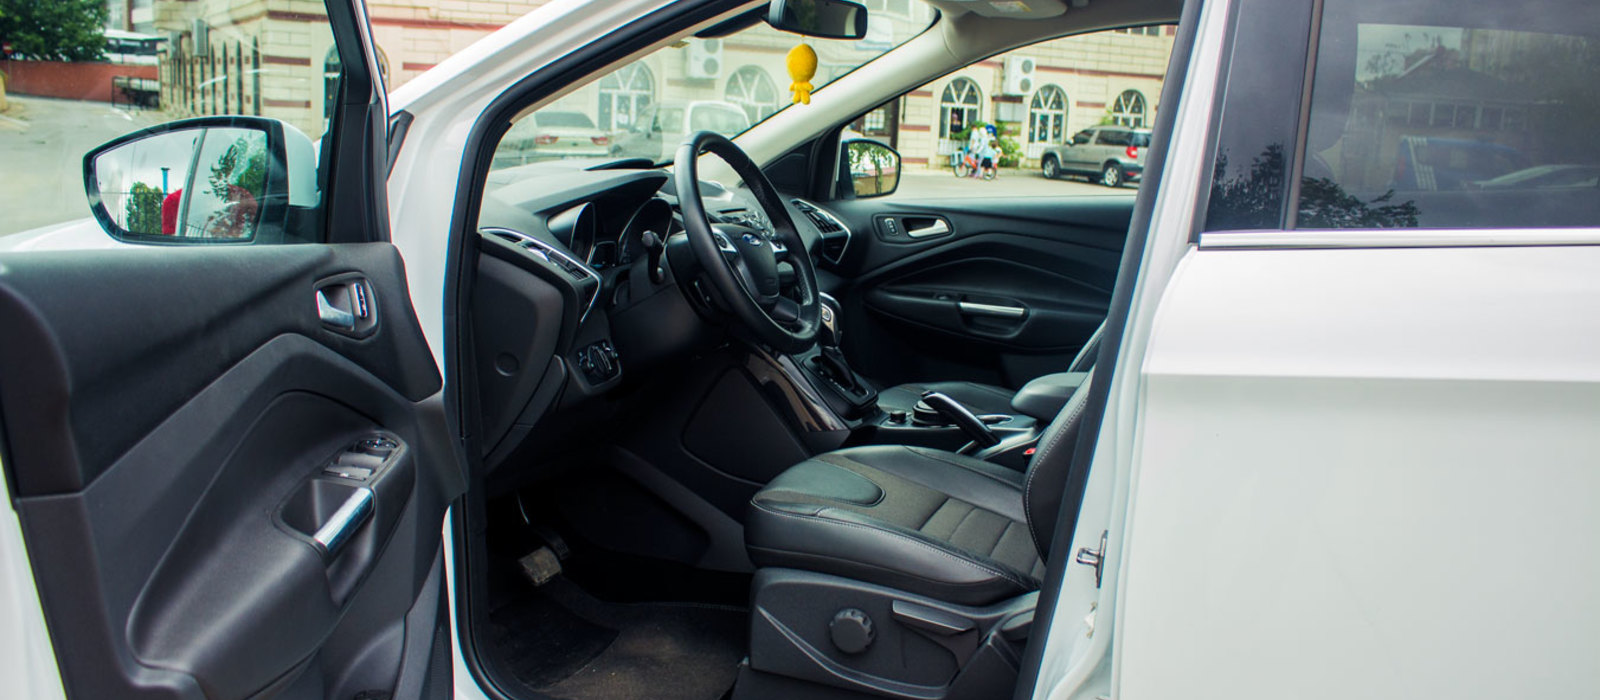 ikinci el araba 2014 Ford Kuga 1.6 EcoBoost Titanium Benzin Otomatik 14000 KM 3